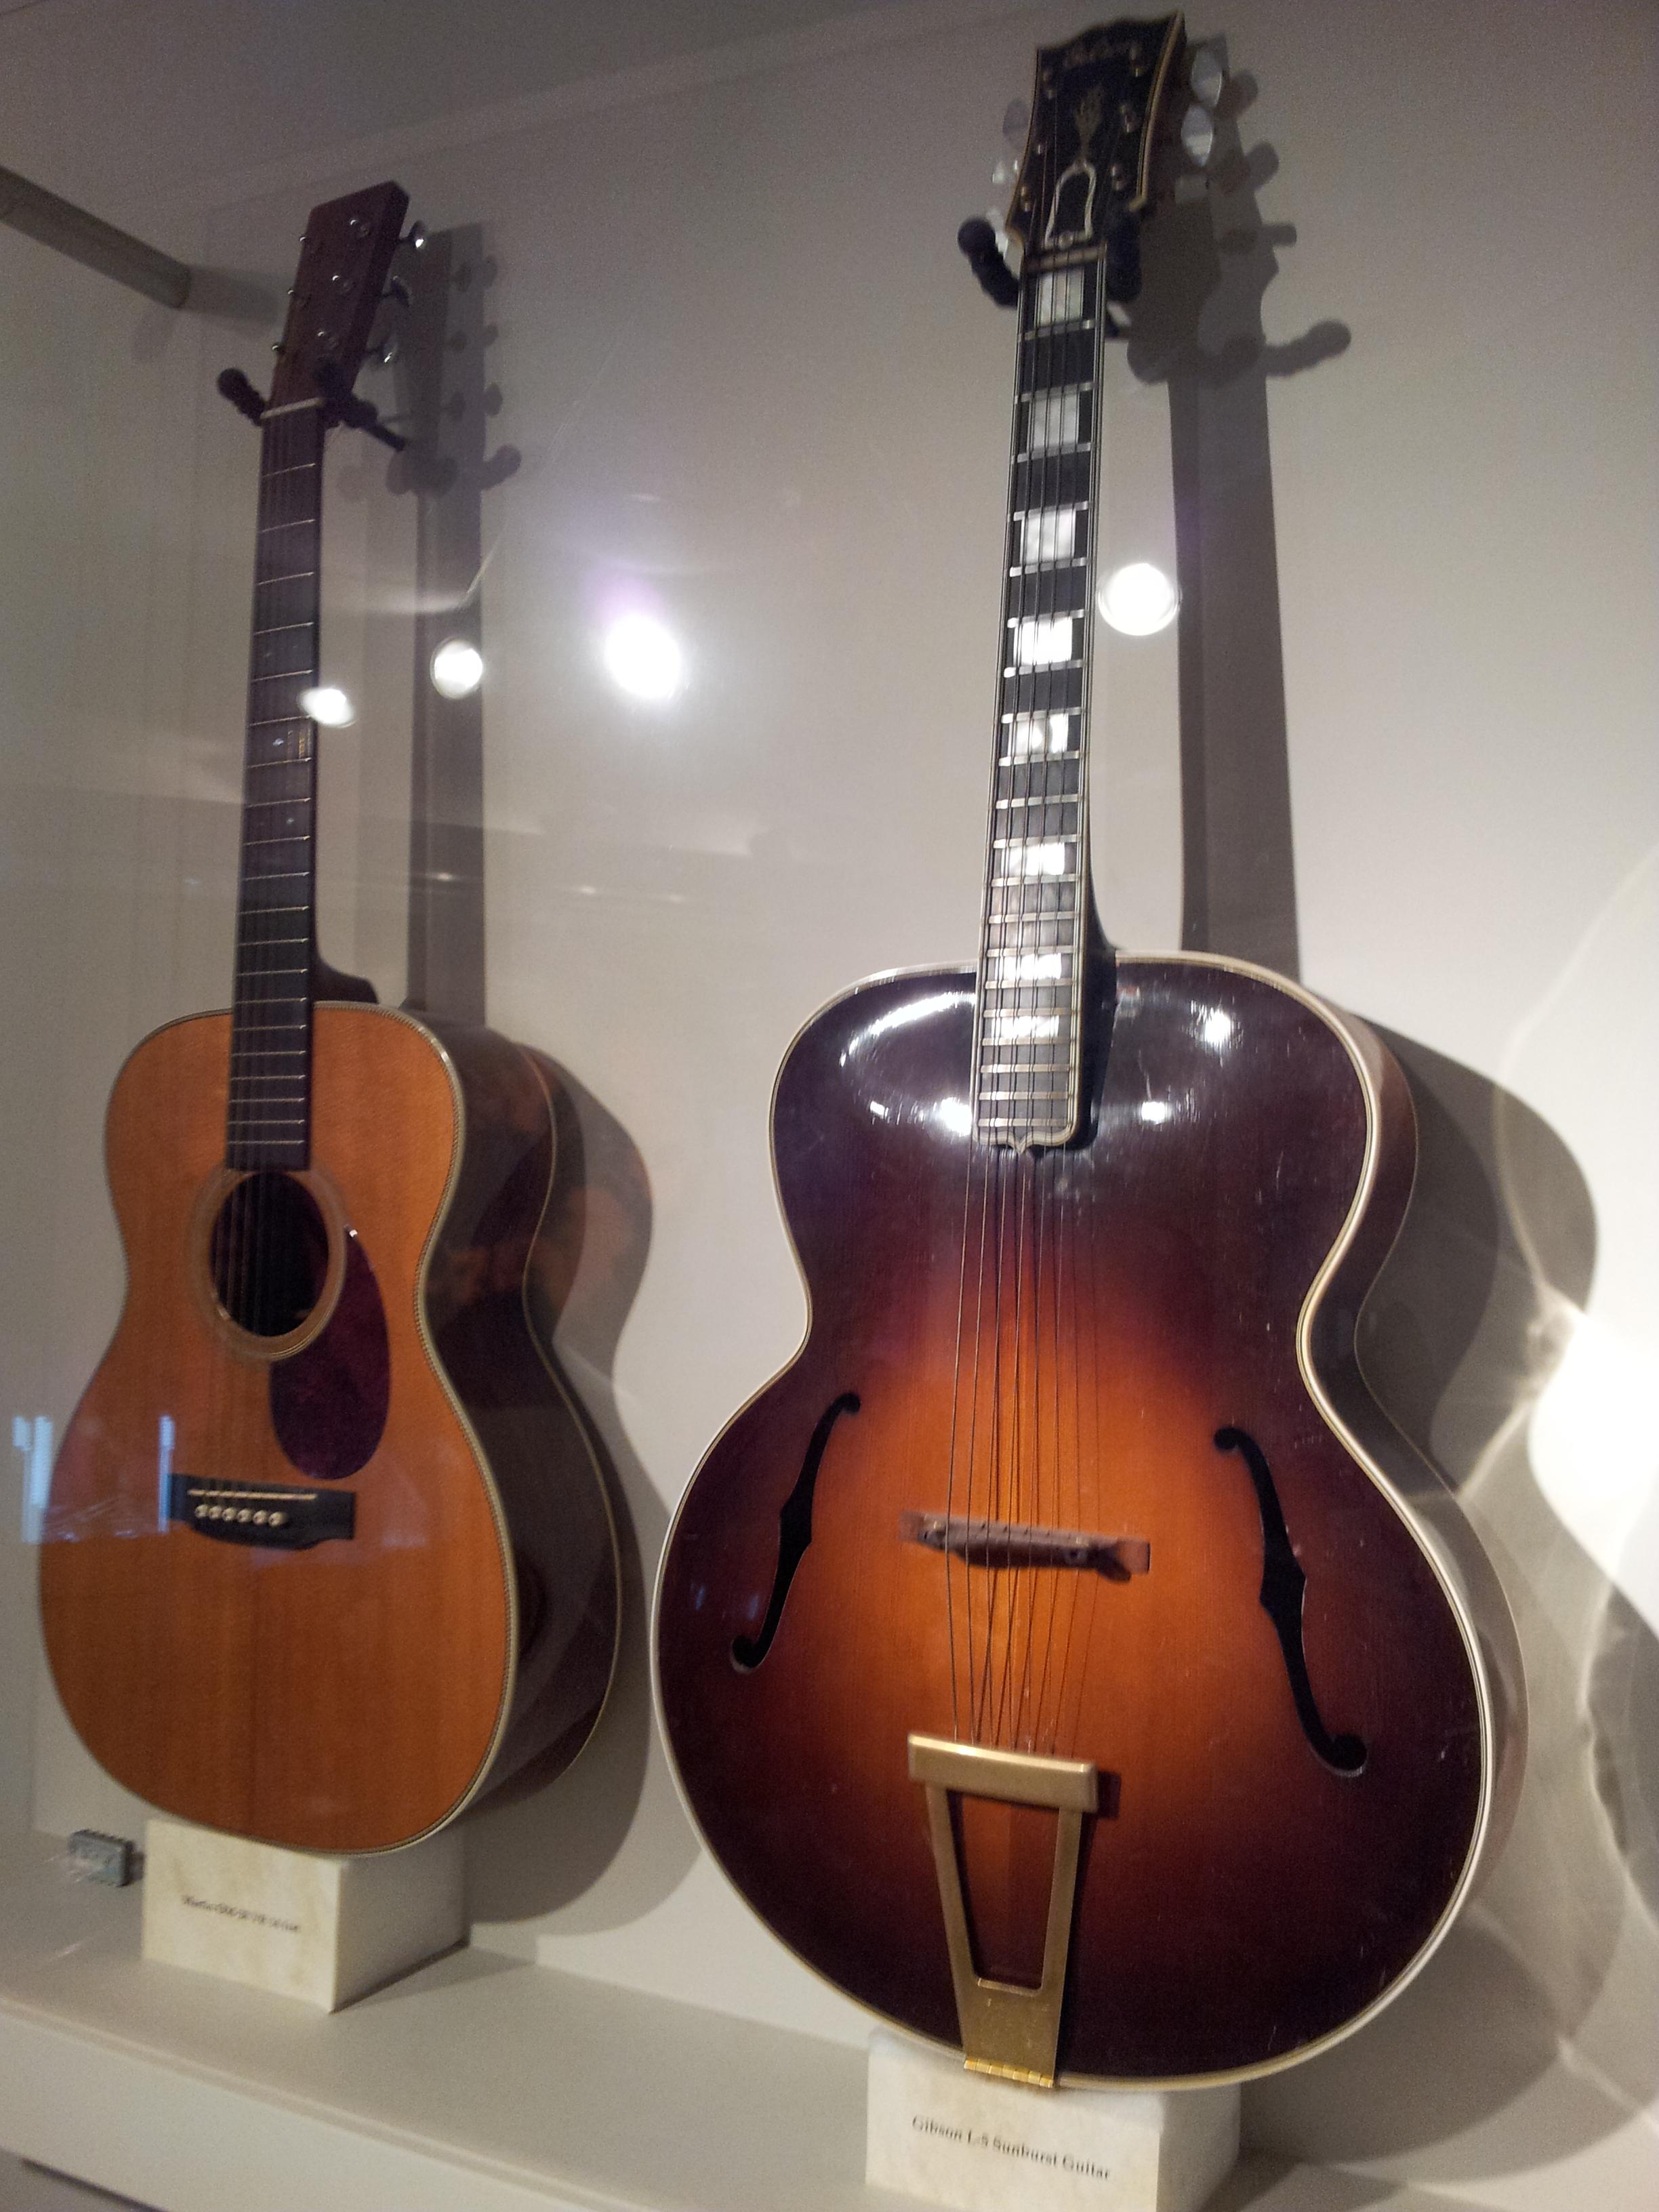 file gibson l 5 sunburst guitar unknown acoustic guitar museum of making. Black Bedroom Furniture Sets. Home Design Ideas